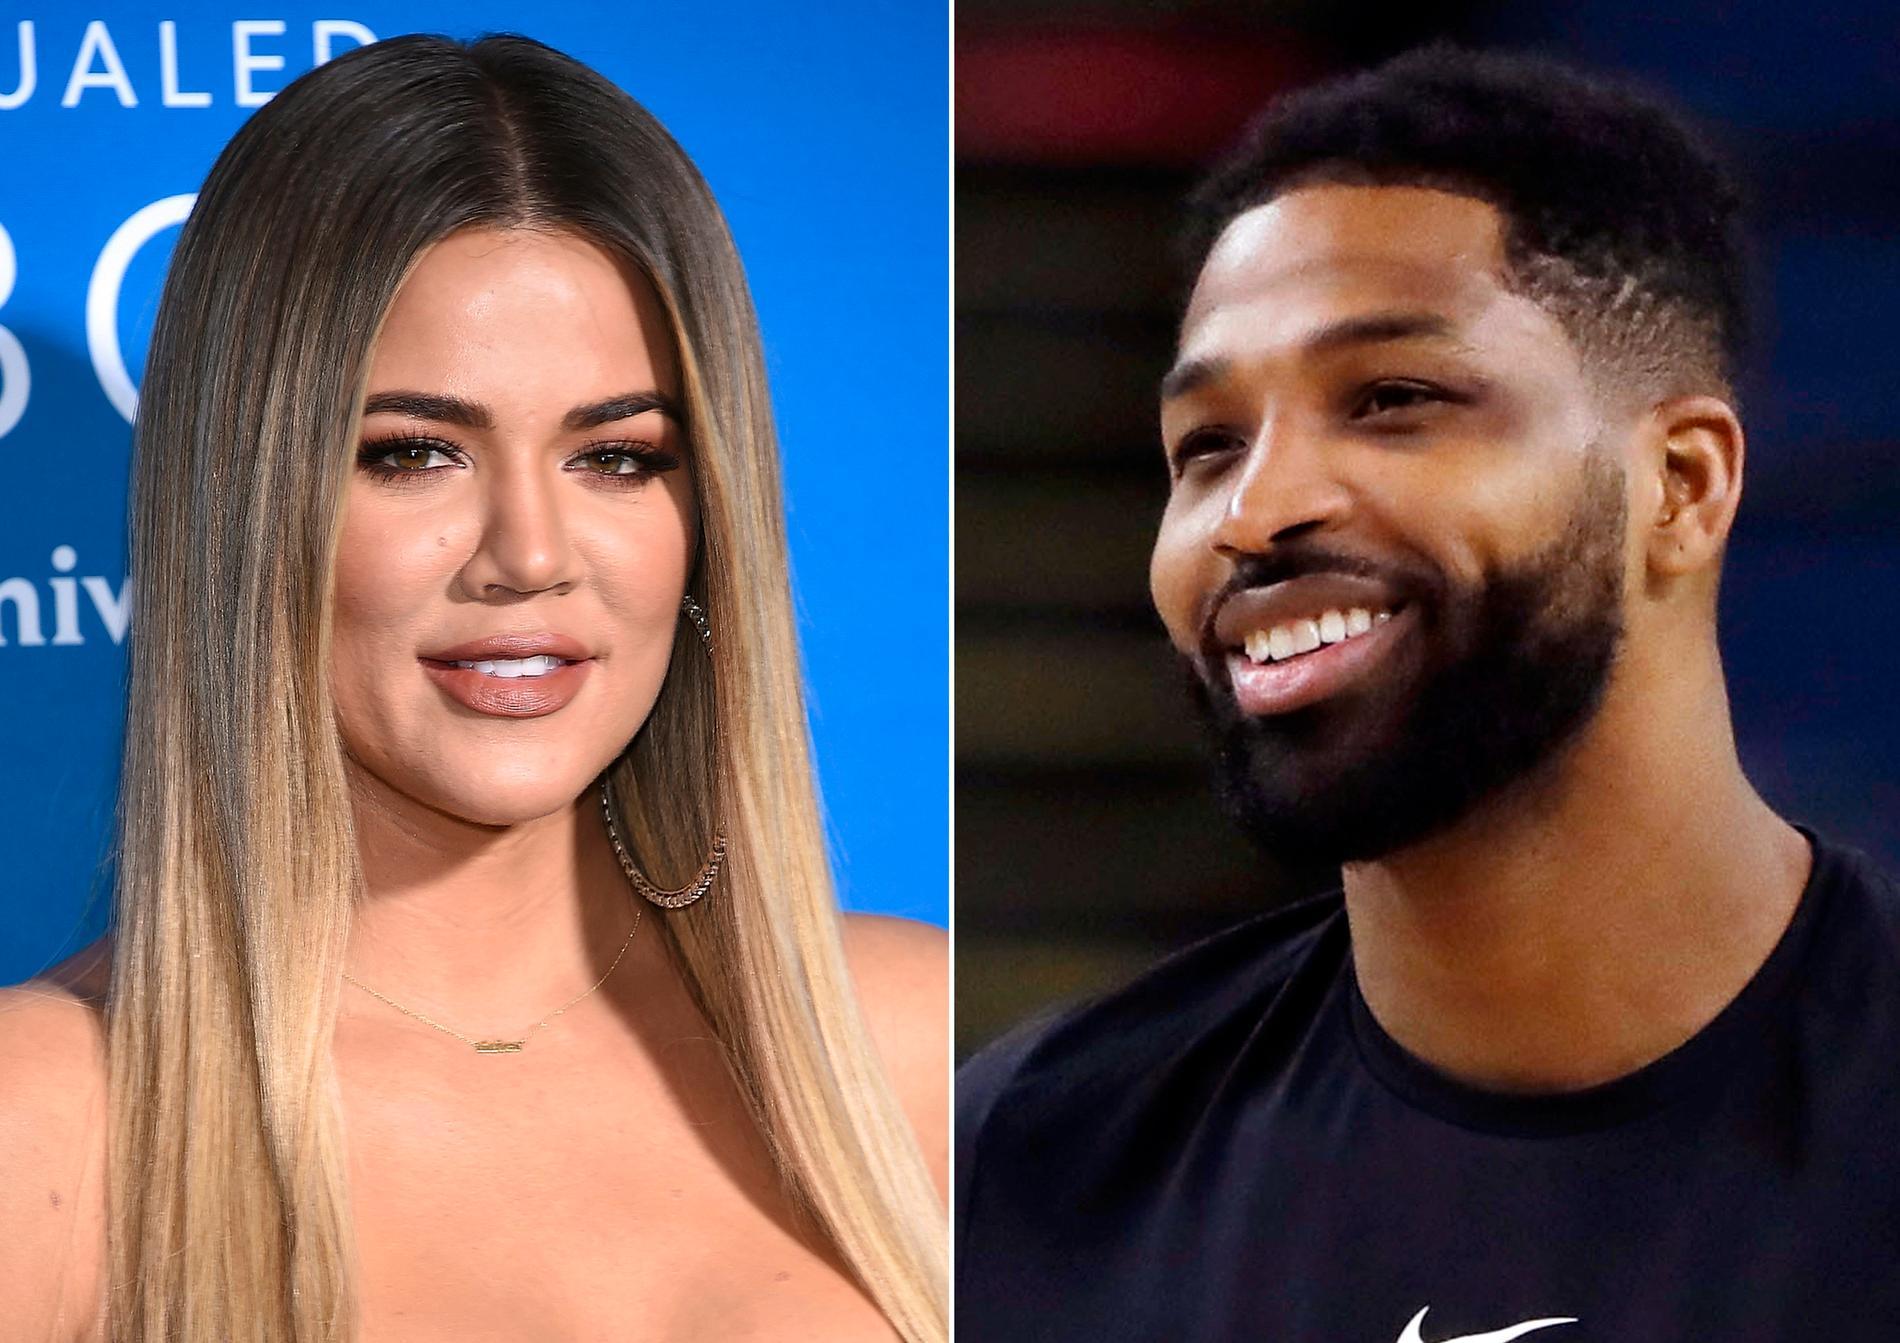 Khloé Kardashian och Tristan Thompson har gjort slut.